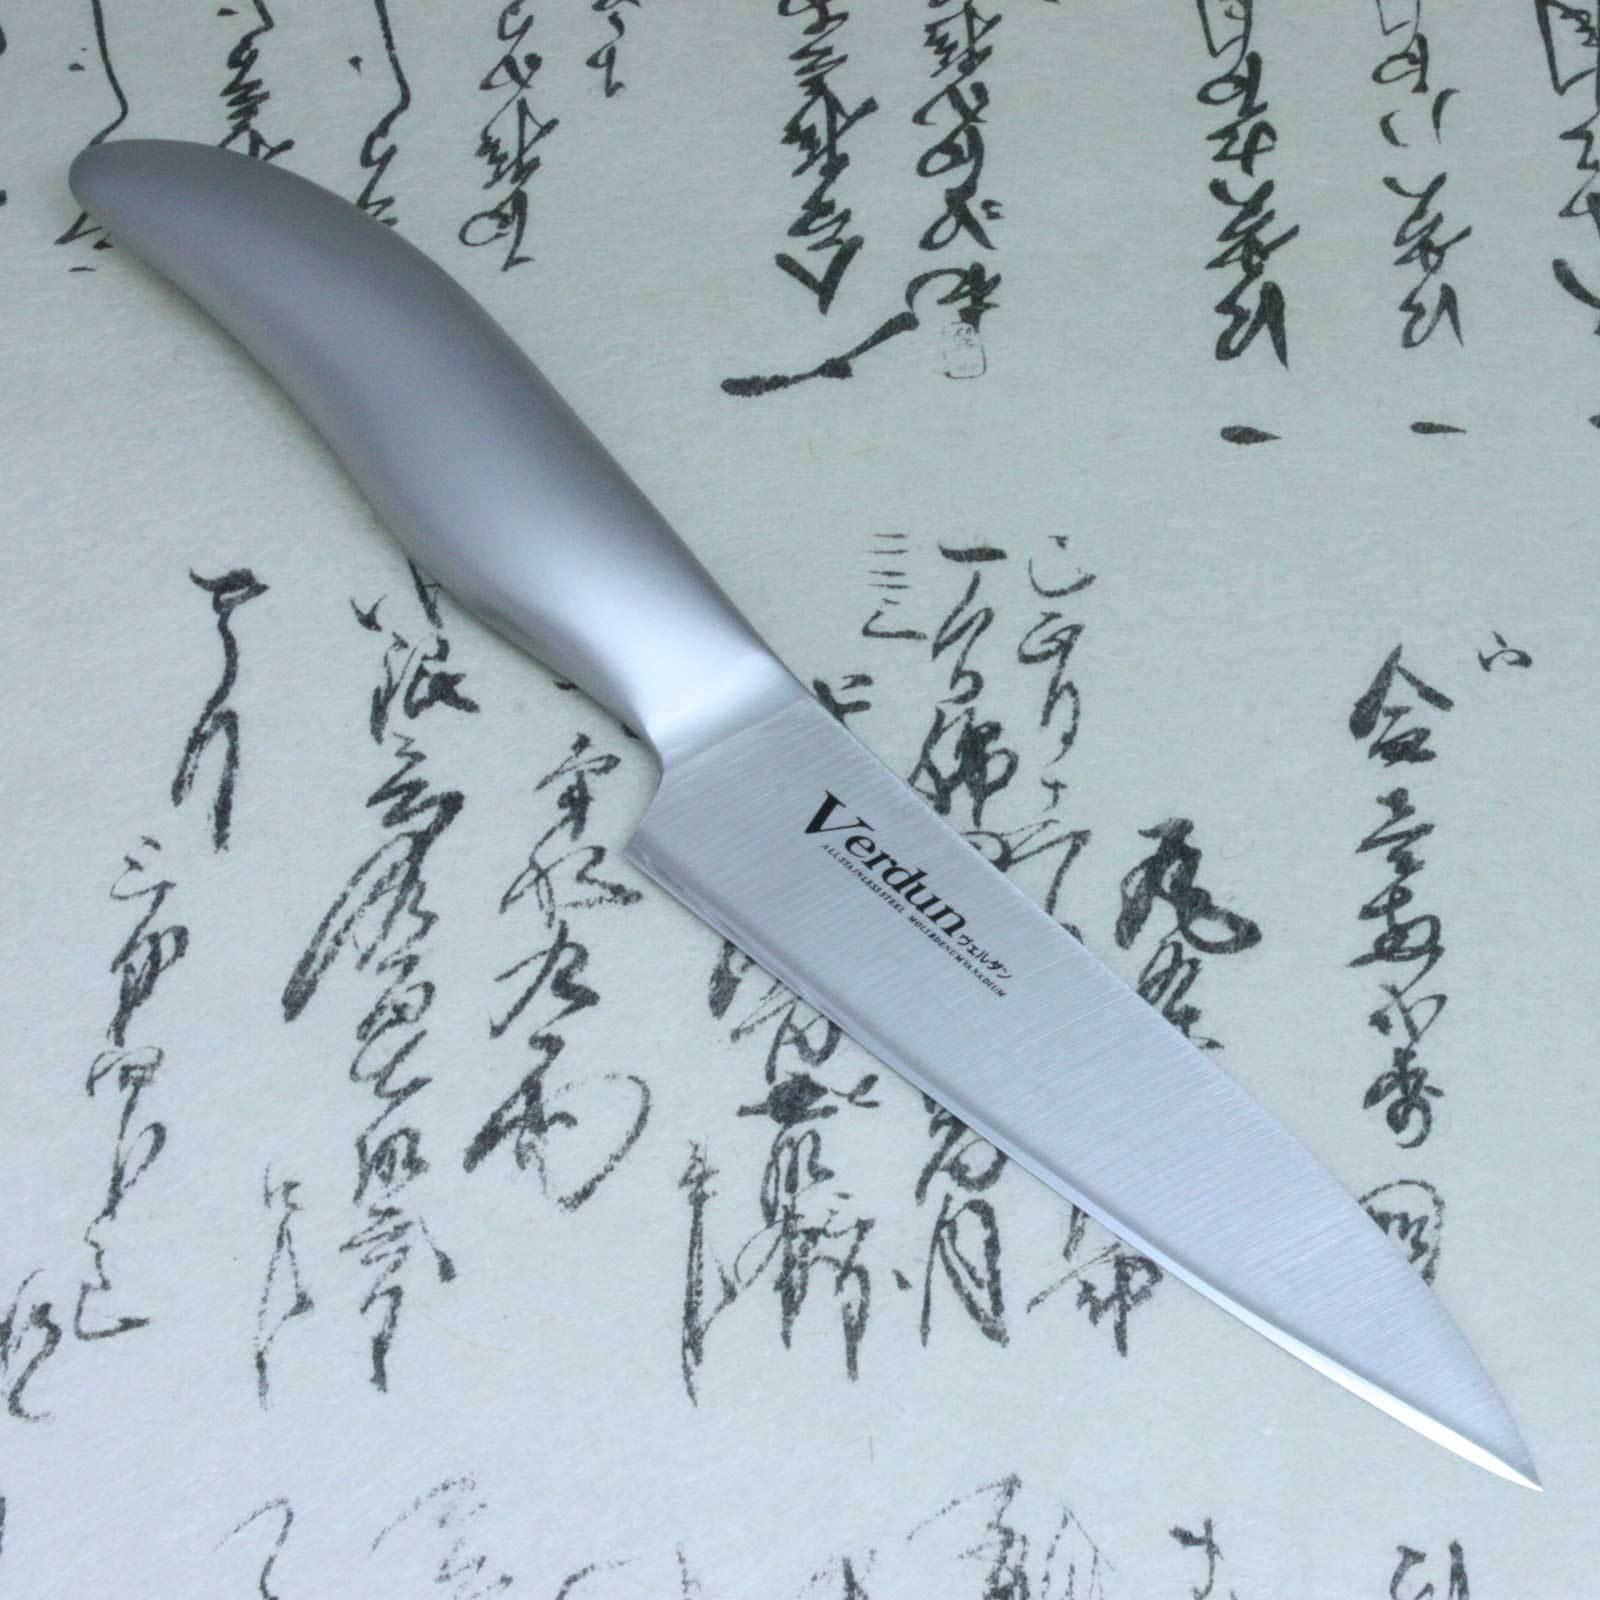 Shimomura Industrial Verdun Petty Knife 125mm Ovd-13 | eBay